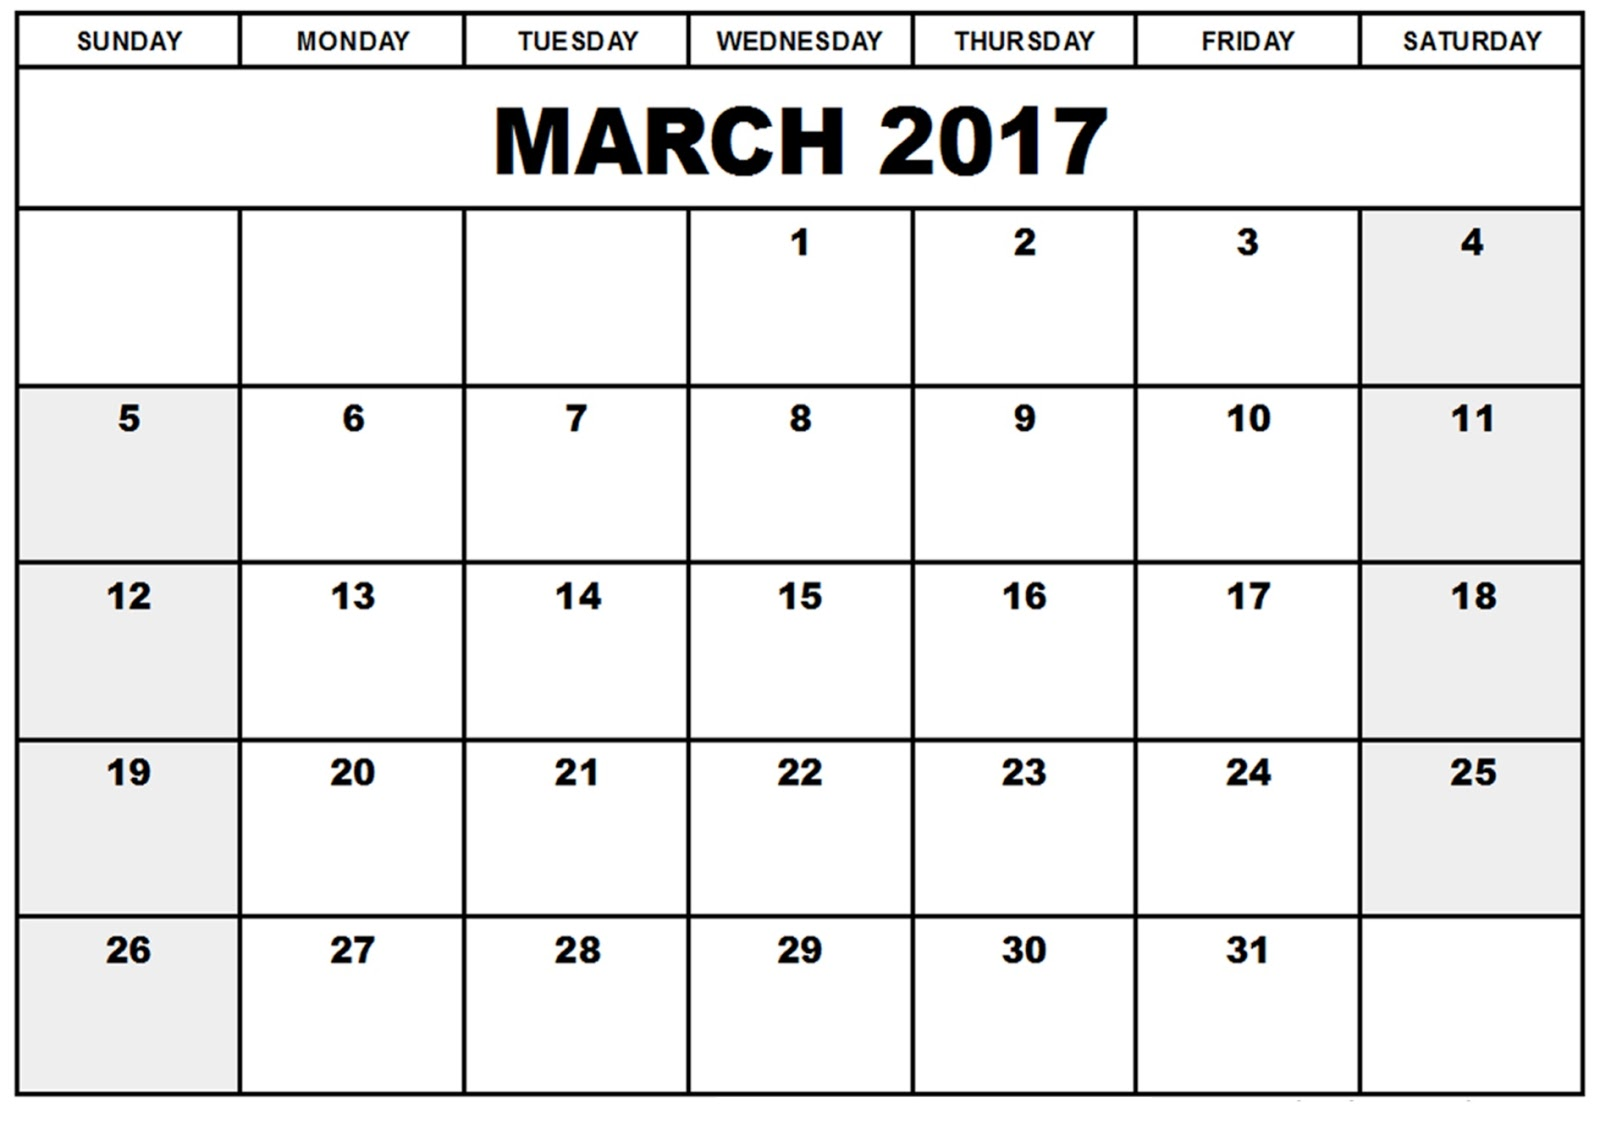 March 2017 Printable Calendar   March 2017 Calendar Template - Get ...